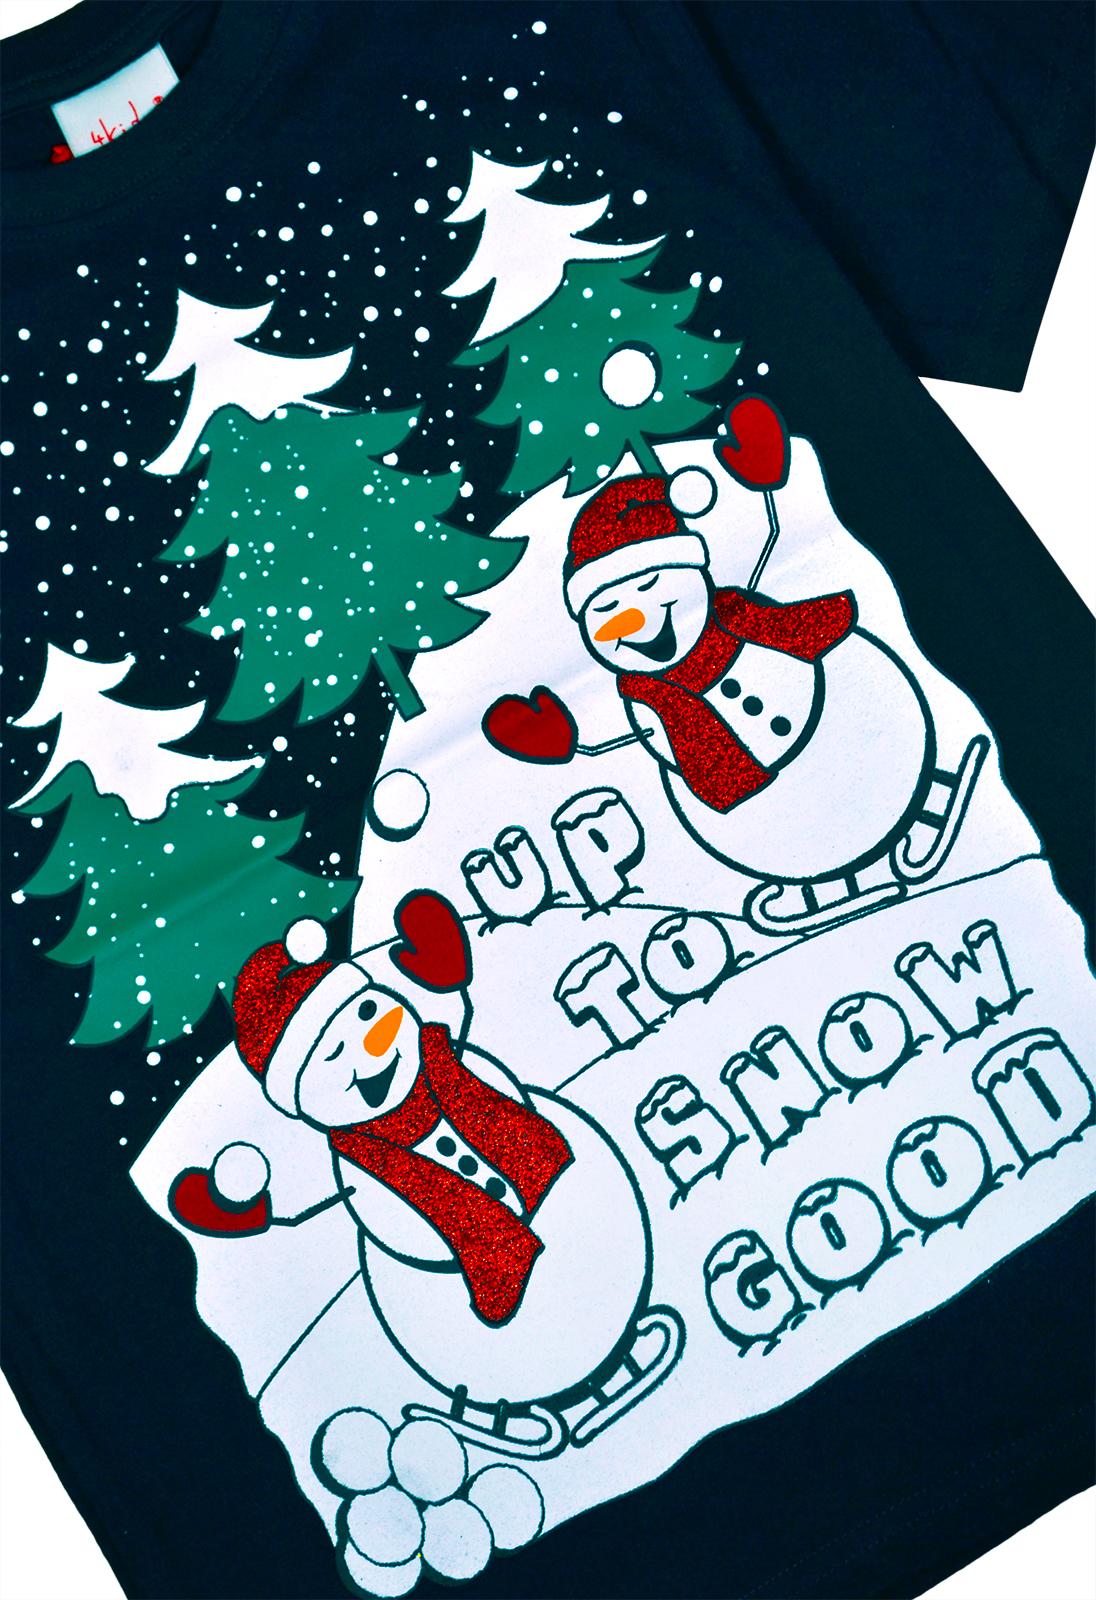 Filles-Garcons-Noel-t-shirts-enfants-Noel-Top-Rouge-Bleu-Marine-Age-7-8-9-10-11-12-13-ans miniature 5